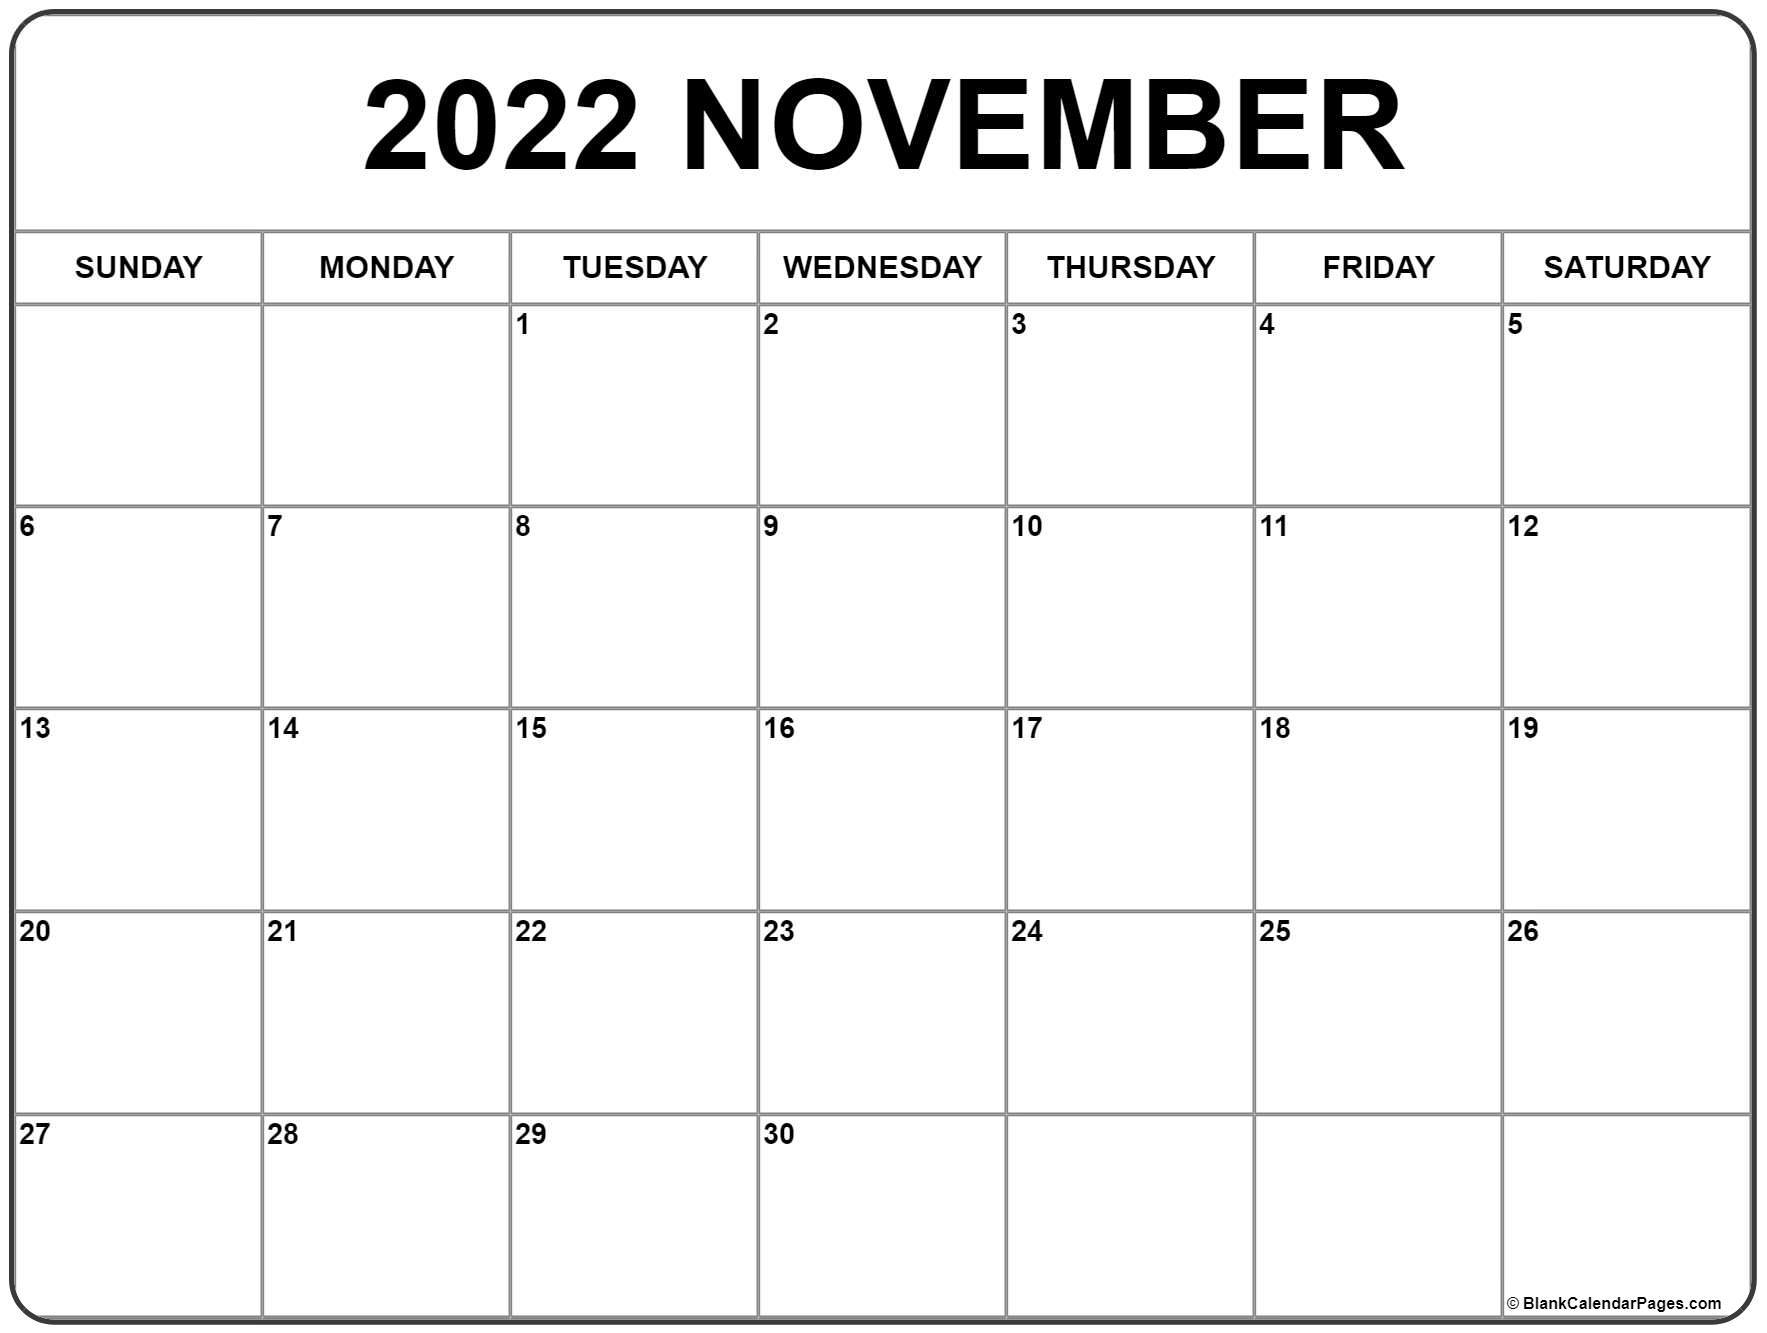 November 2018 calendar . November 2018 calendar printableNovember 2018 printable calendar. November calendar 2018